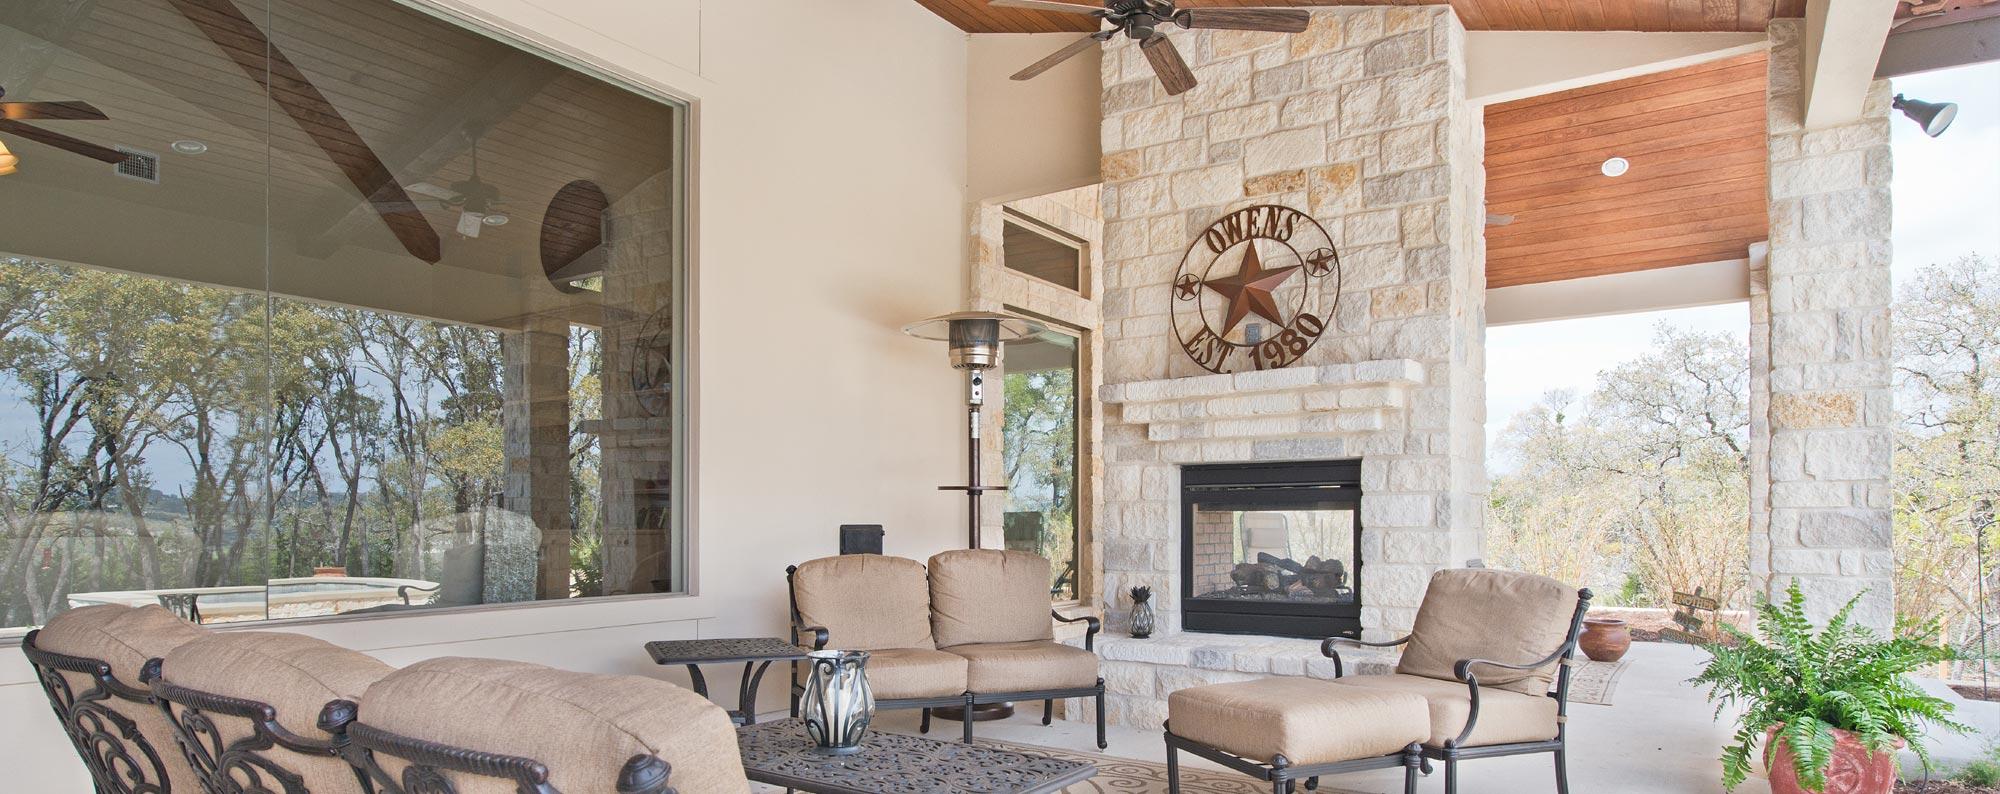 Custom Home Exterior Features